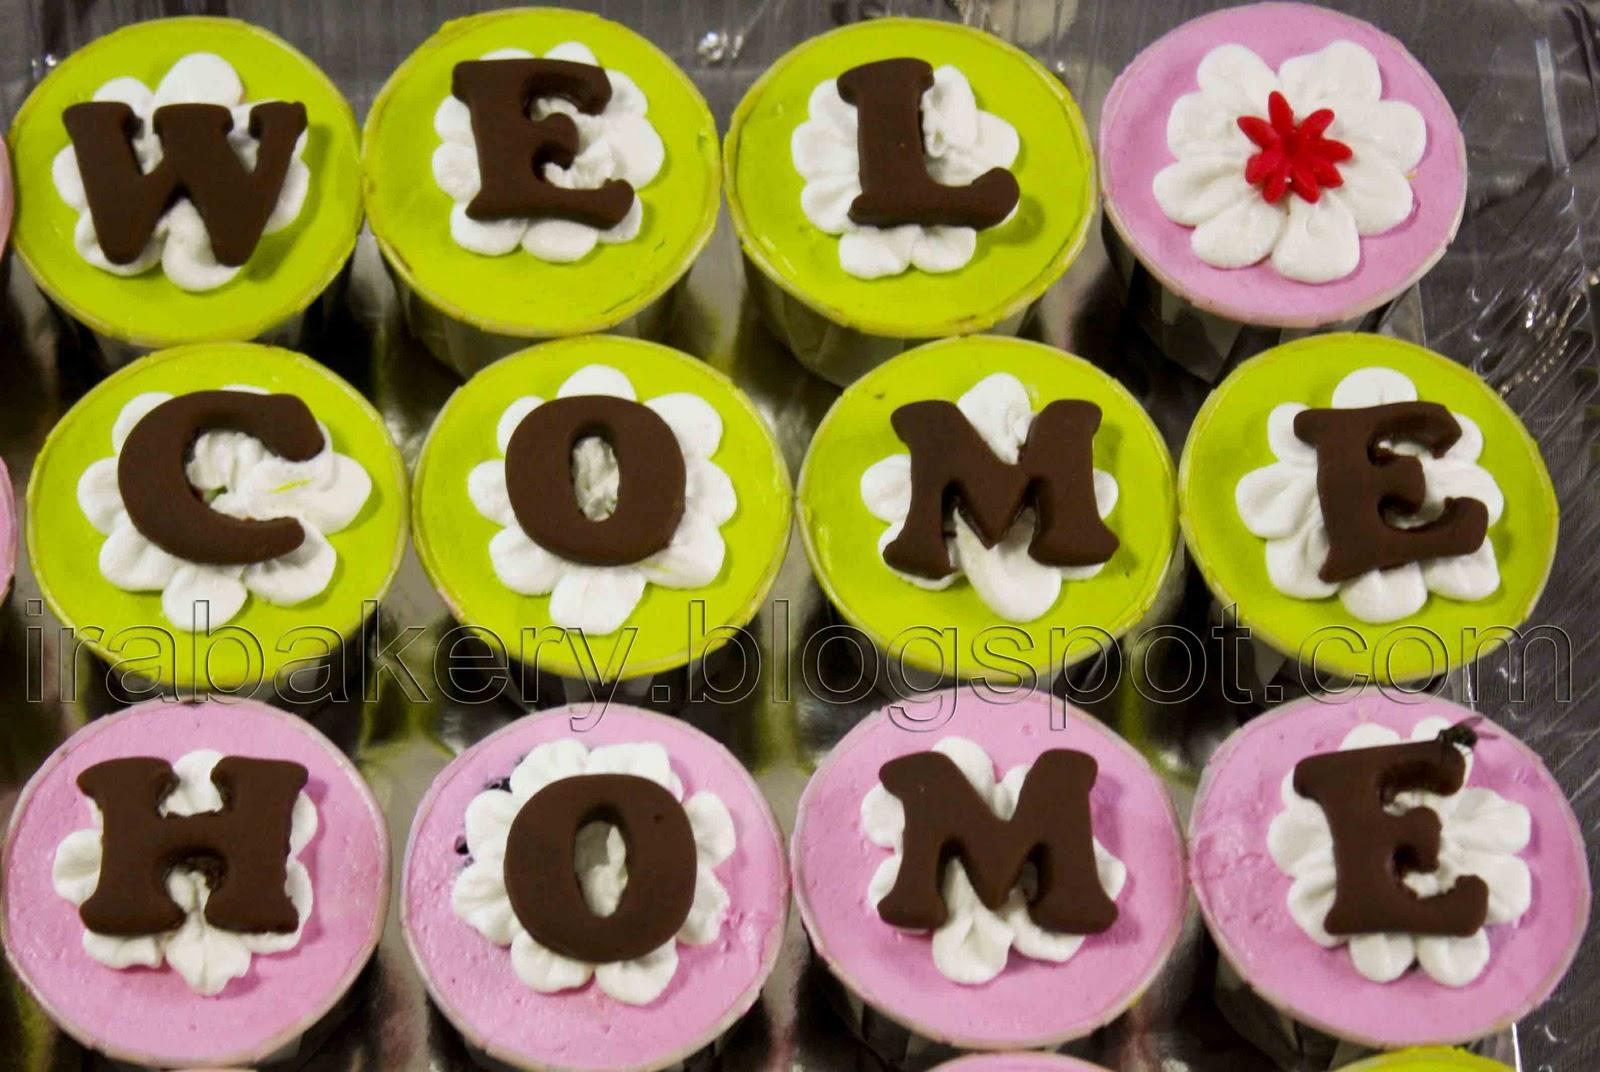 Deco Cakes, Cupcakes, Cheese cake & Kek Lapis Sarawak in Kuching: 2010